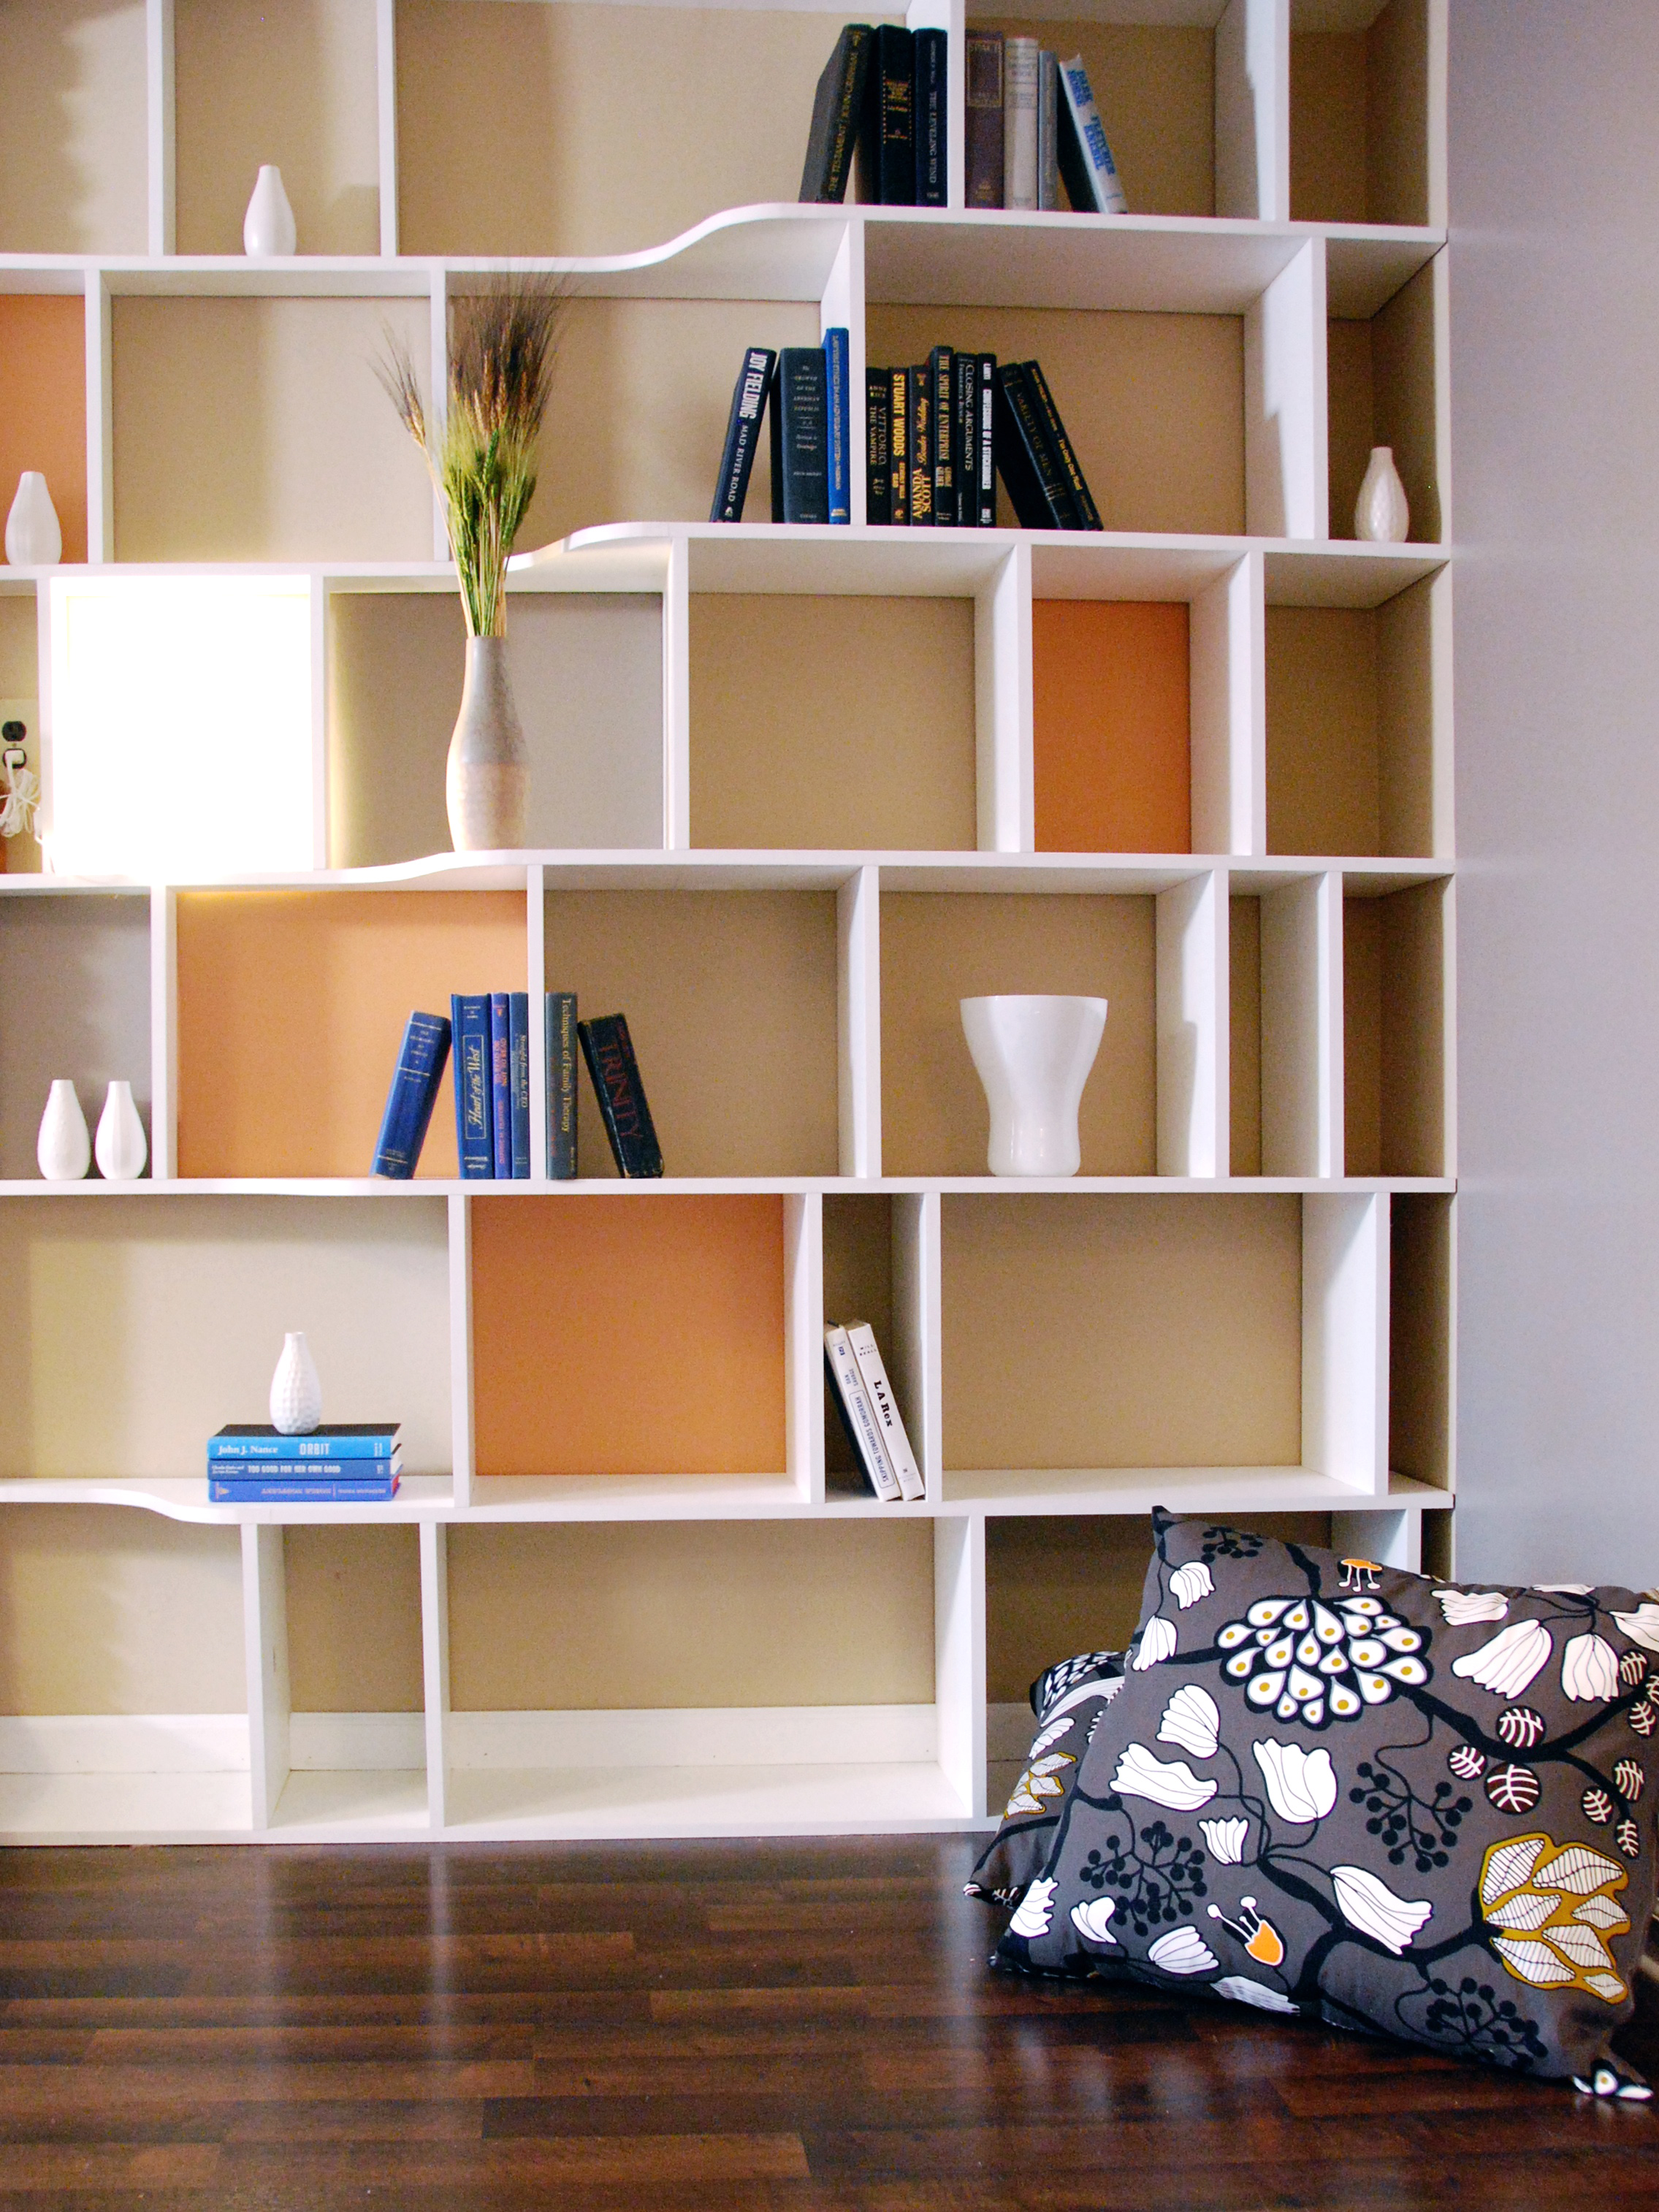 2 Shelf Bokcase White 04 - 2 Shelf Bokcase White